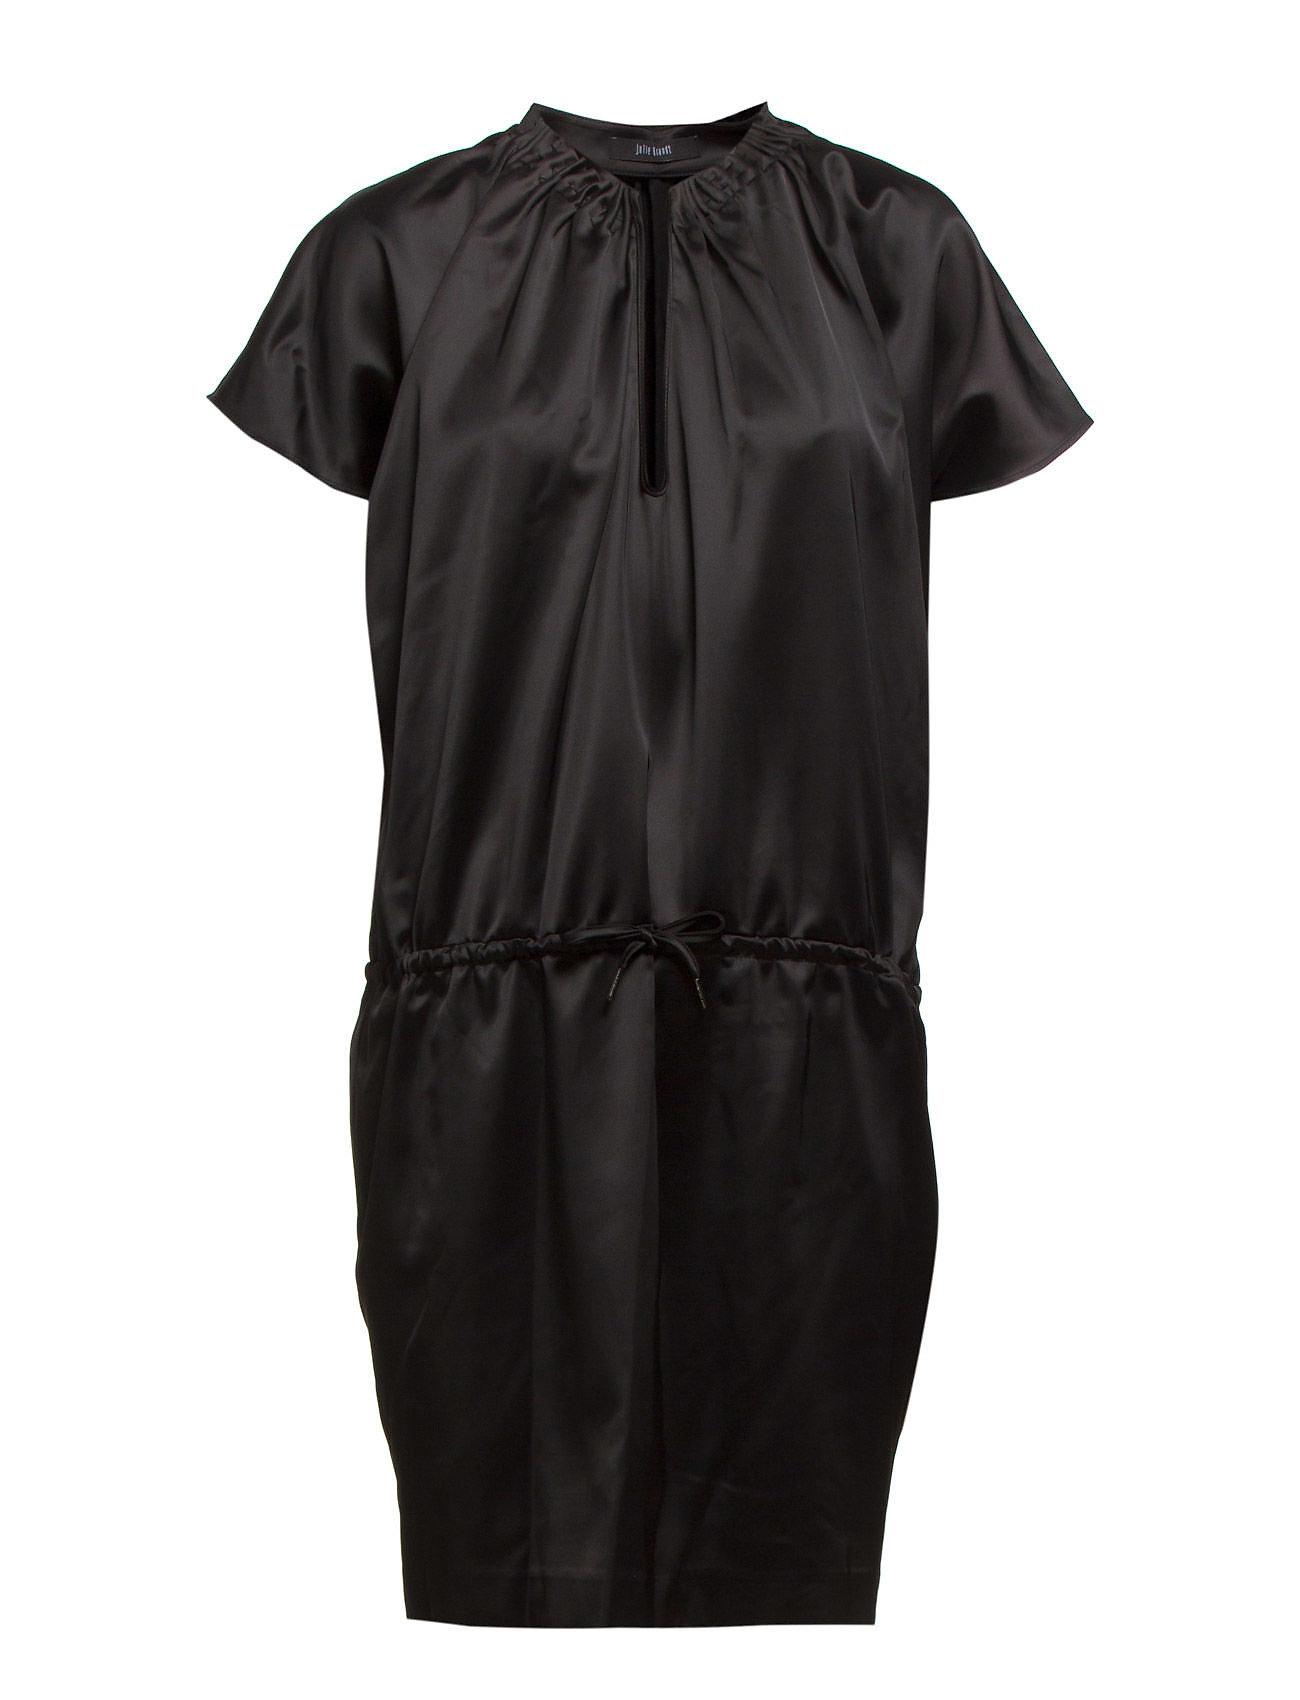 JULIE BRANDT Delena Dress - BLACK STONE